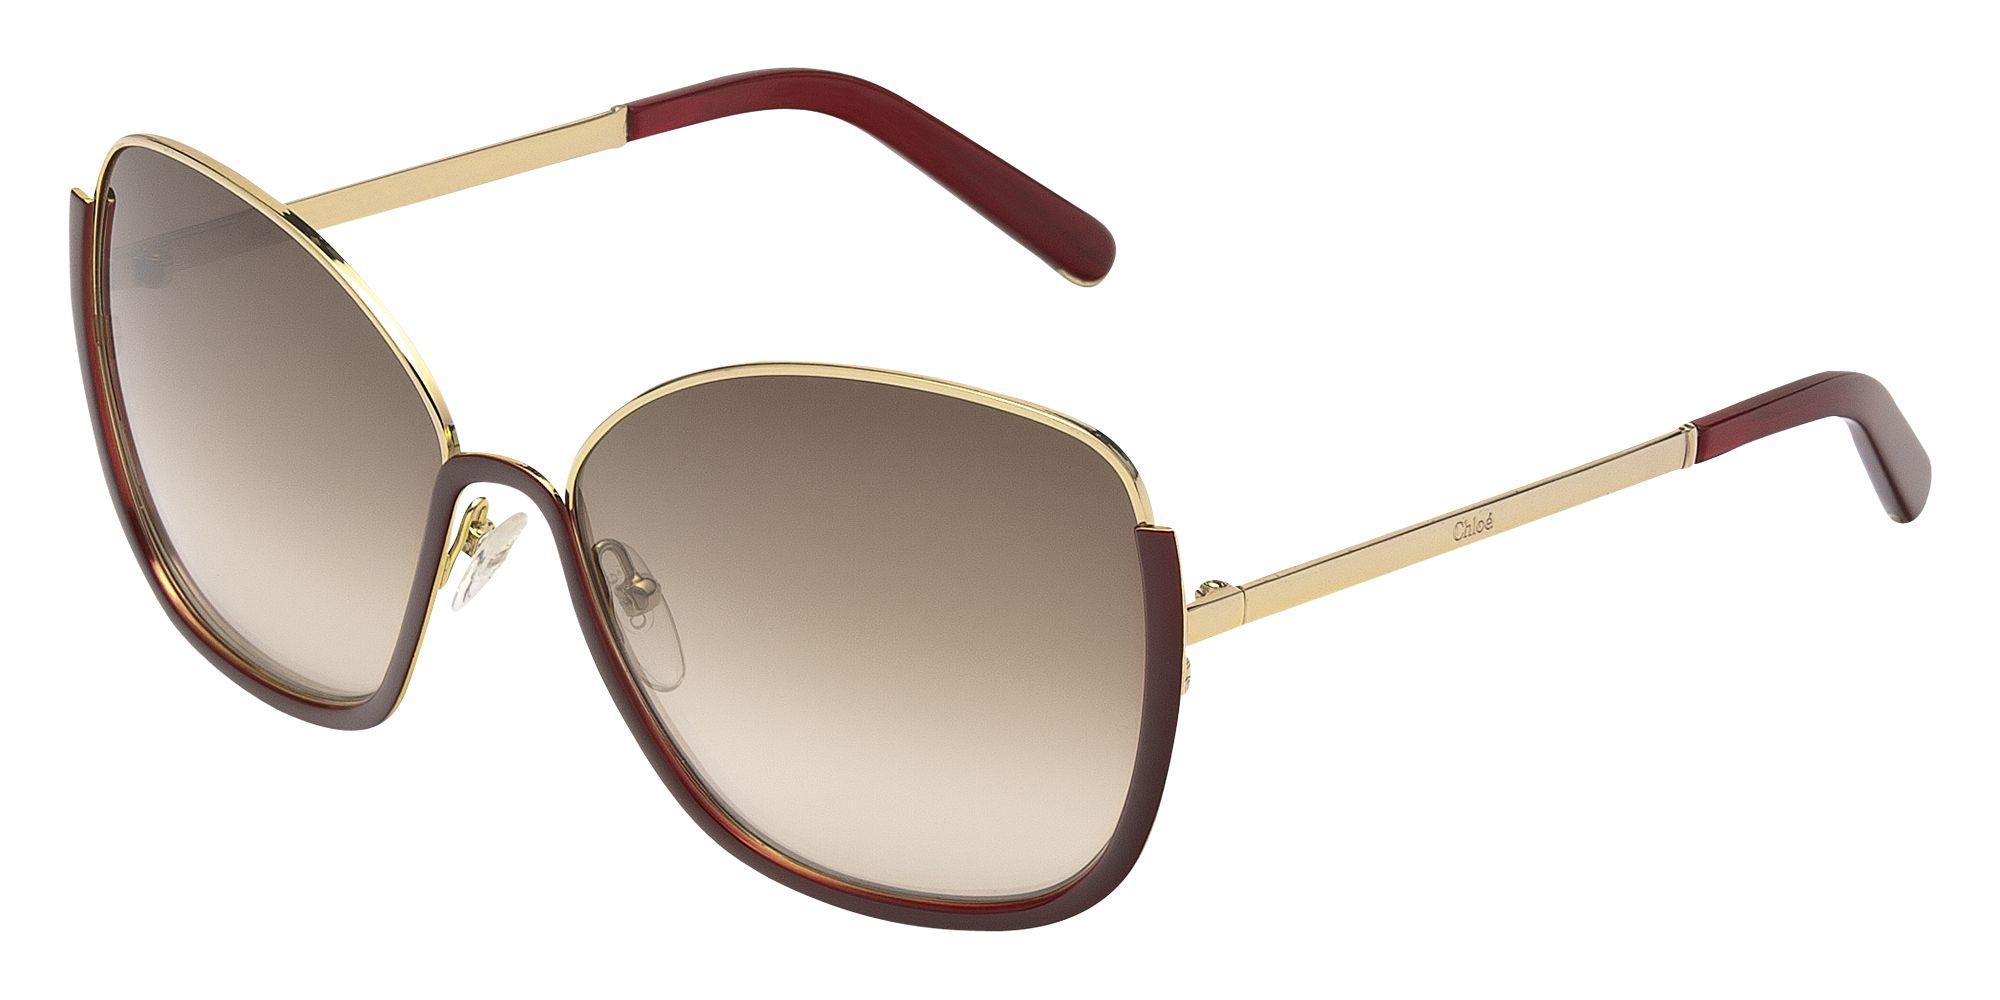 "<strong>Chloe</strong> sunglasses, $346, <a href=""http://marchon.com/HTML/chloe.asp#"">marchon.com</a>."